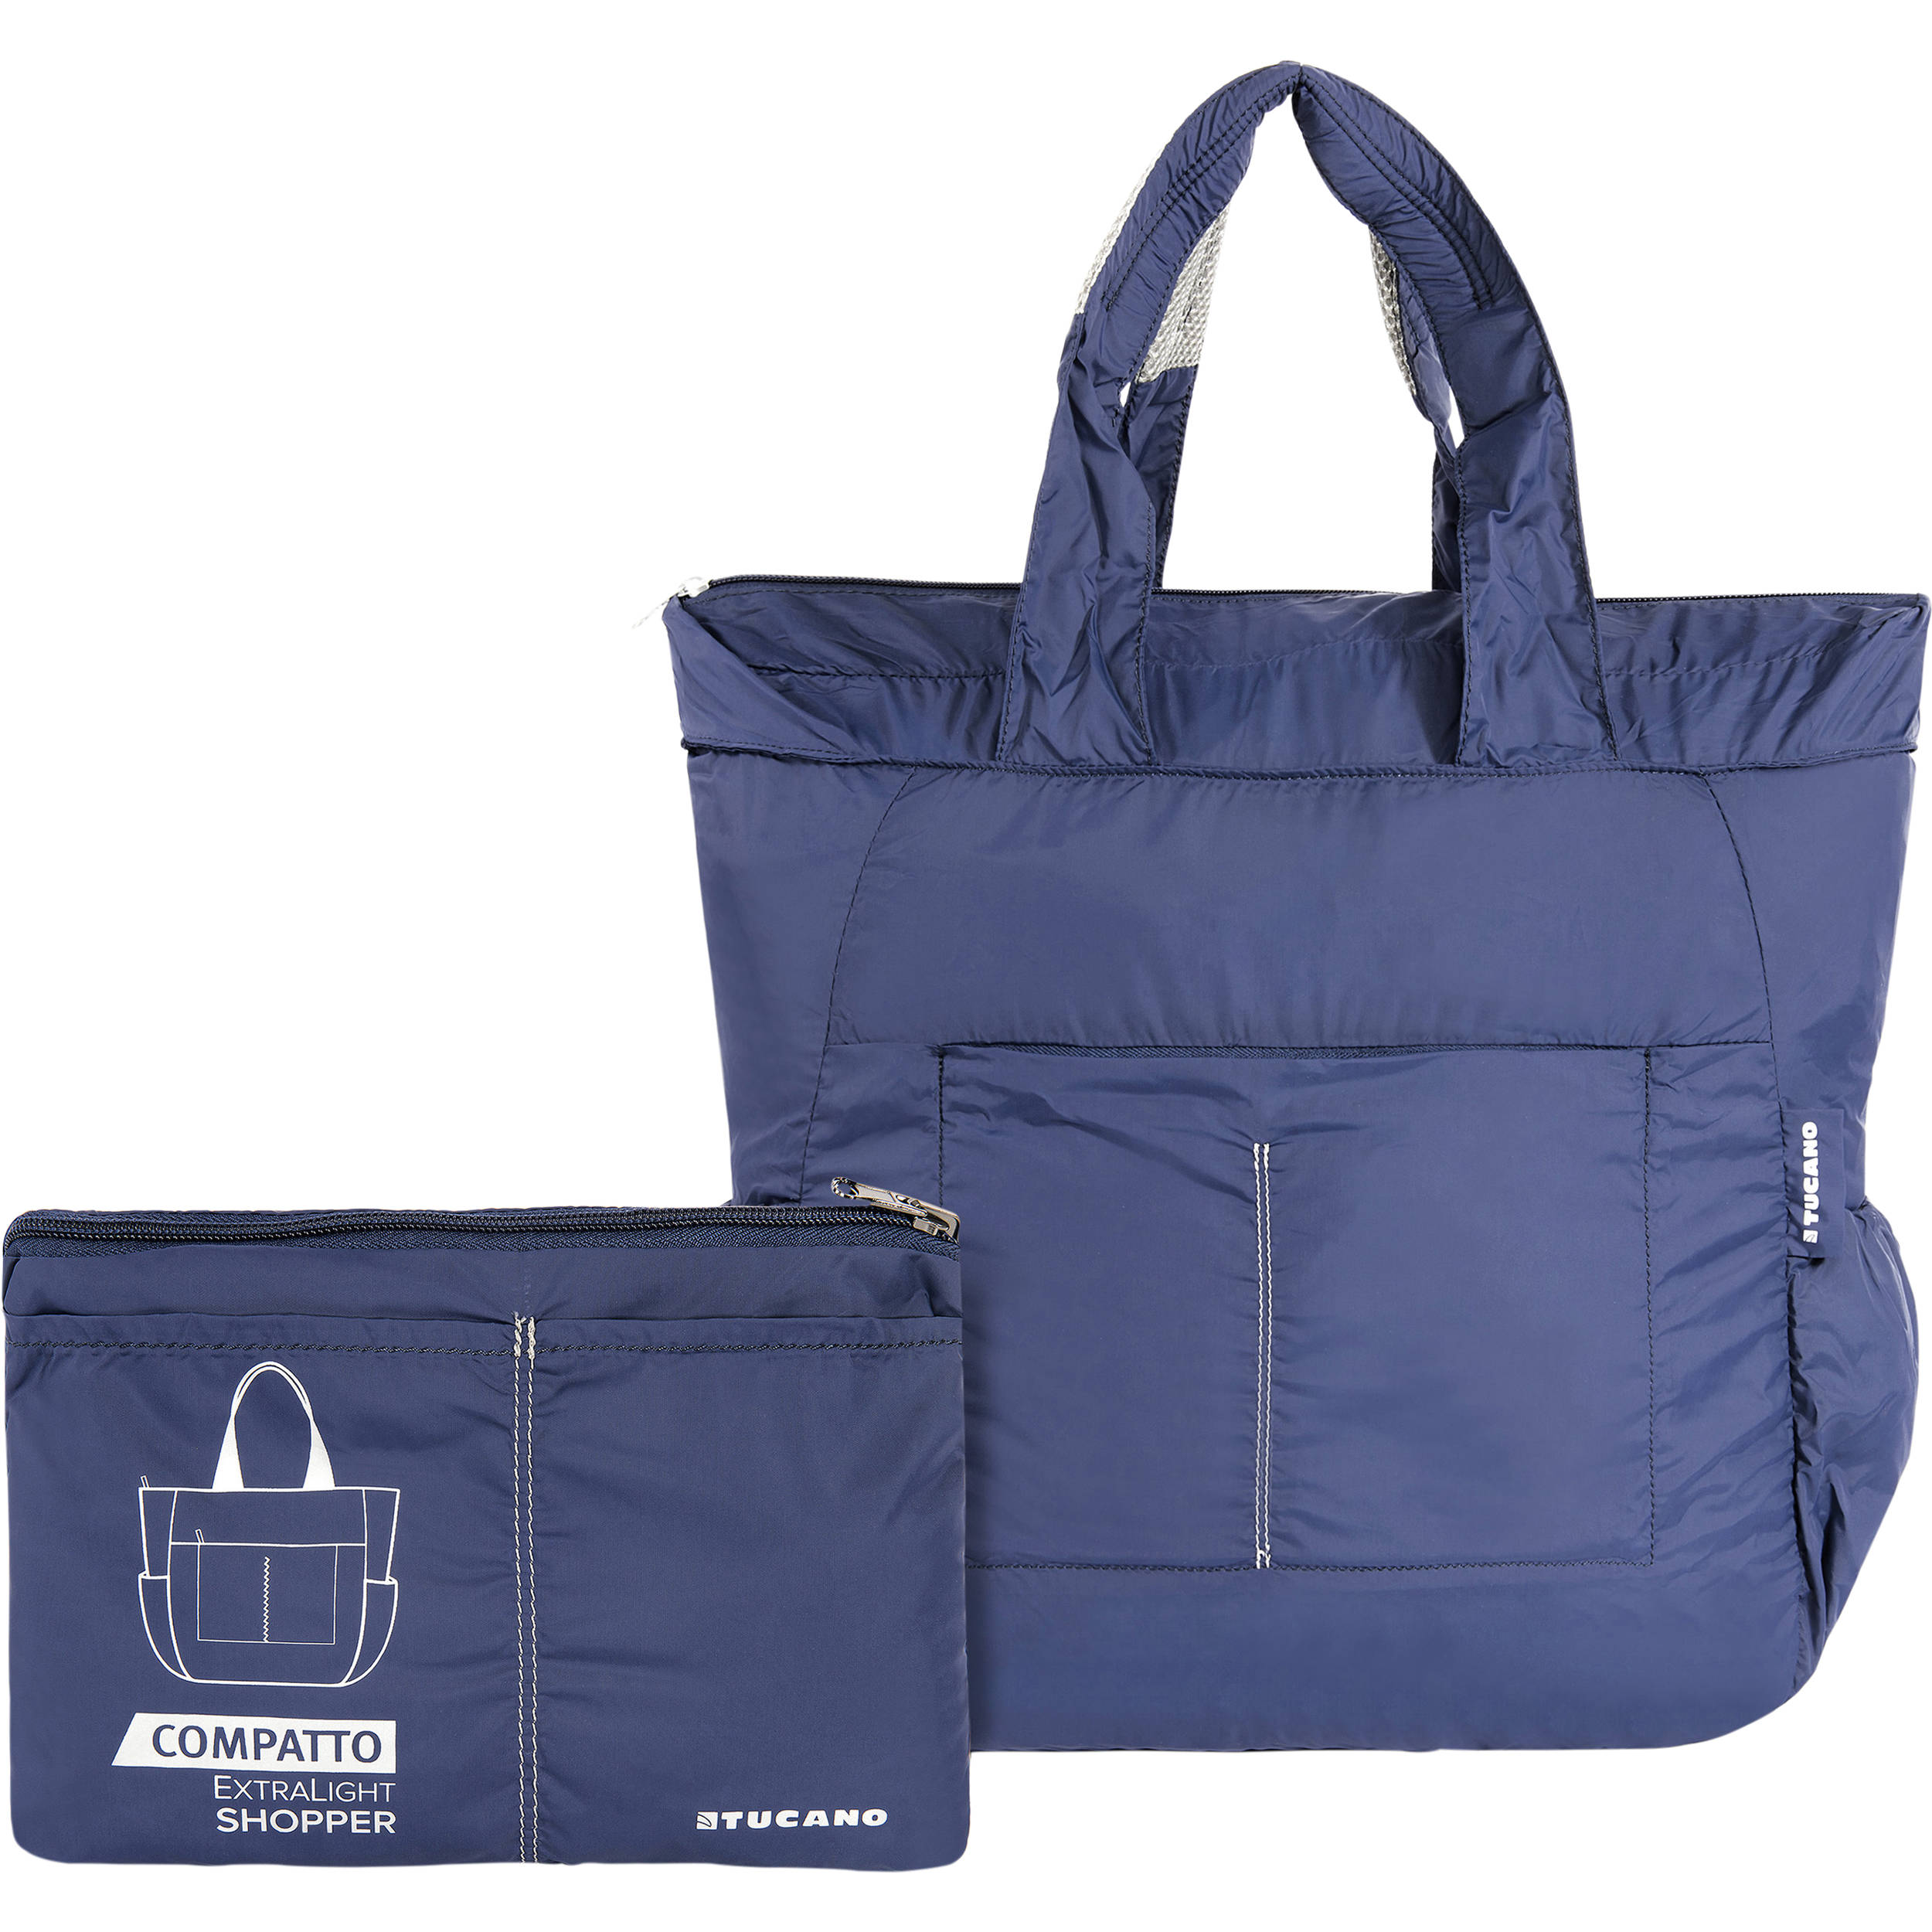 tucano extra light 20l water resistant shopping bag bpcosh b b u0026h